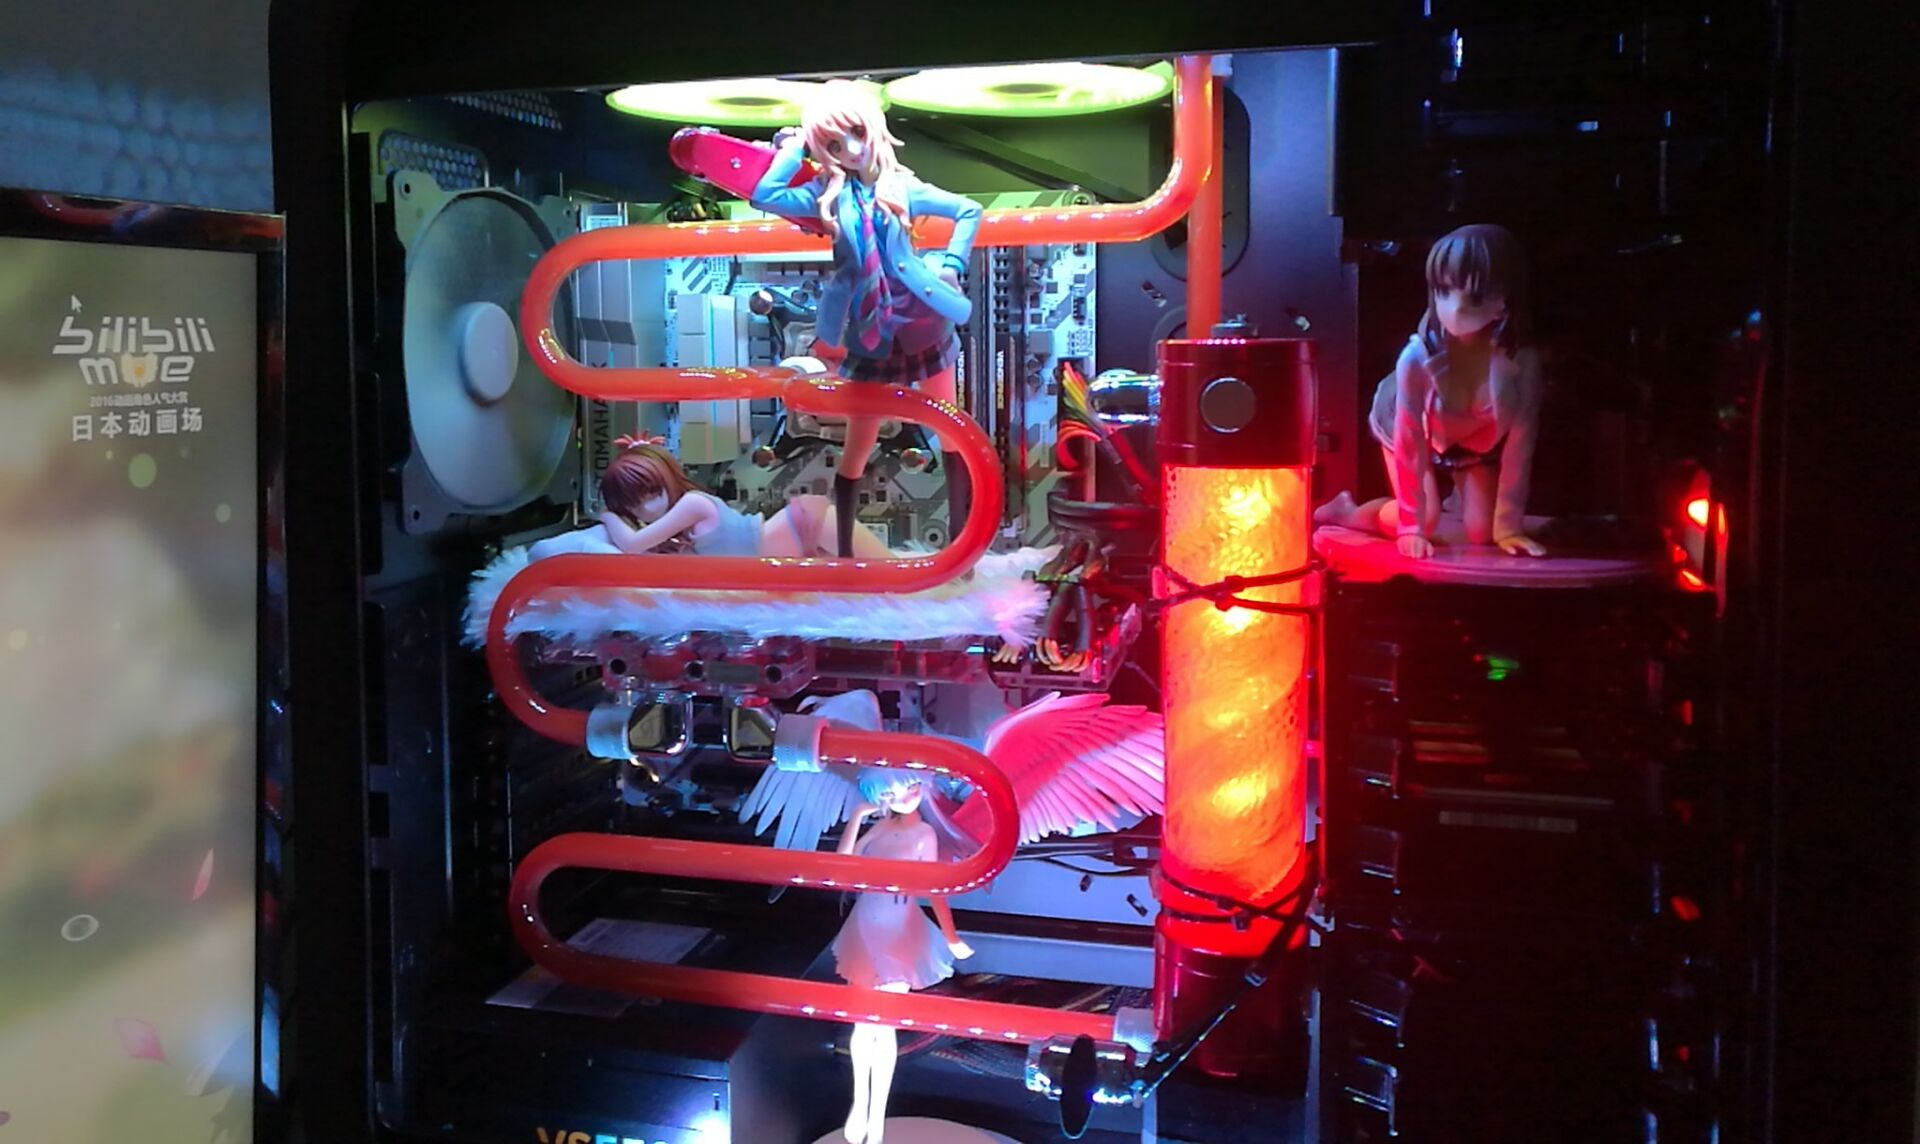 Saekano:How to Raise a Boring Girlfriend Megumi Kato Anime Garage Kits Dolls Figure Statue-Garage Kit Dolls